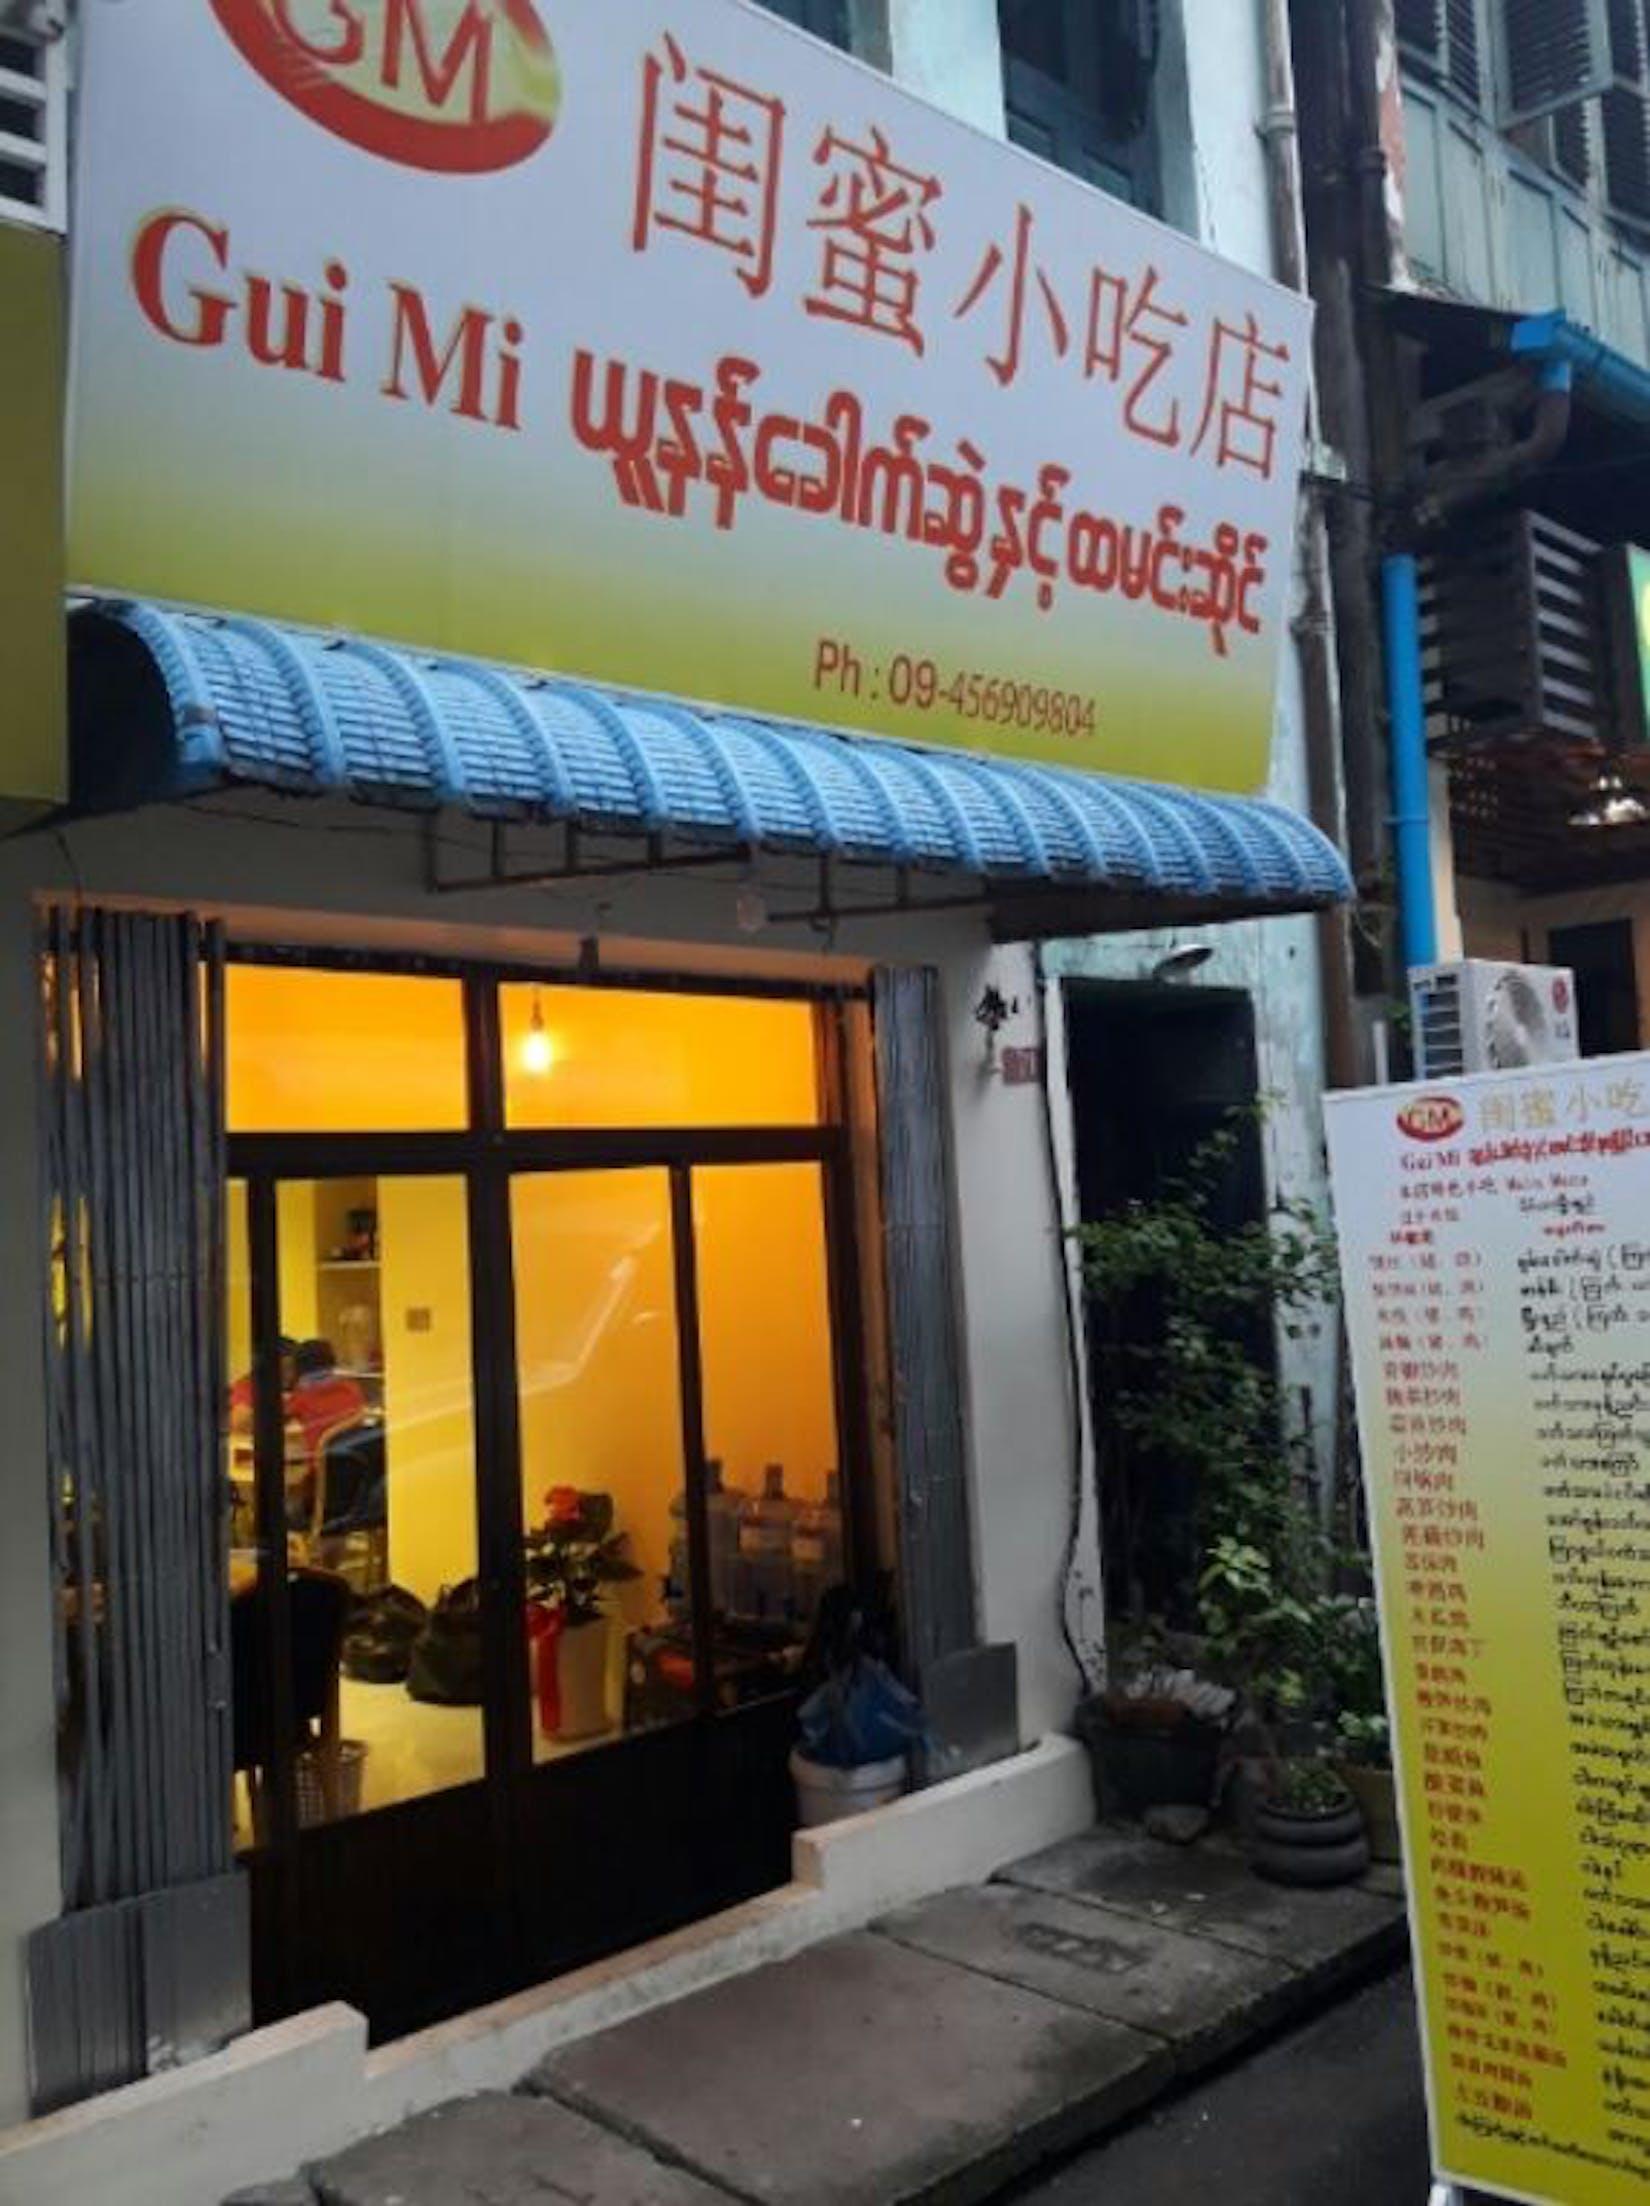 fuxiang ယူနန်ခေါက်ဆွဲနှင့်ထမင်းဆိုင် | yathar